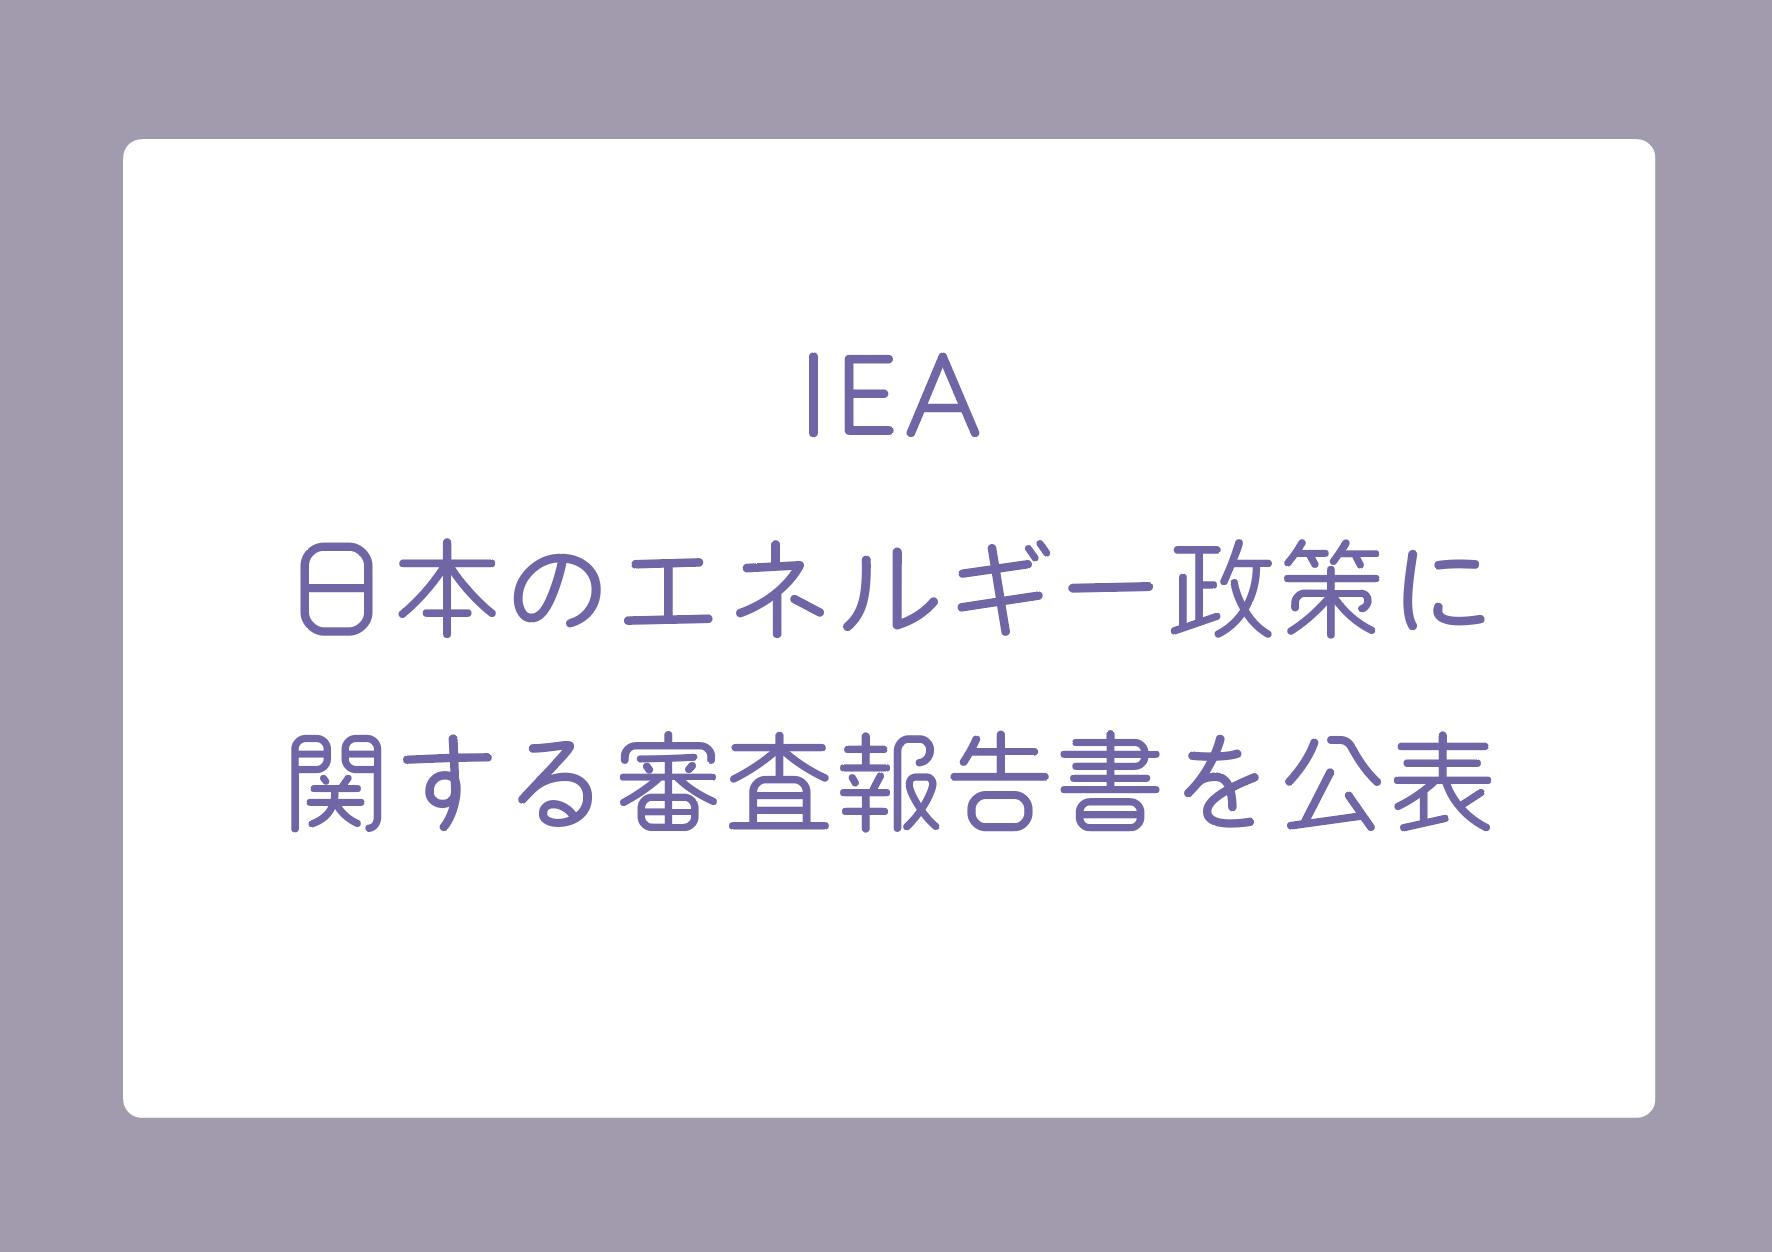 IEA 日本のエネルギー政策に 関する審査報告書を公表の画像